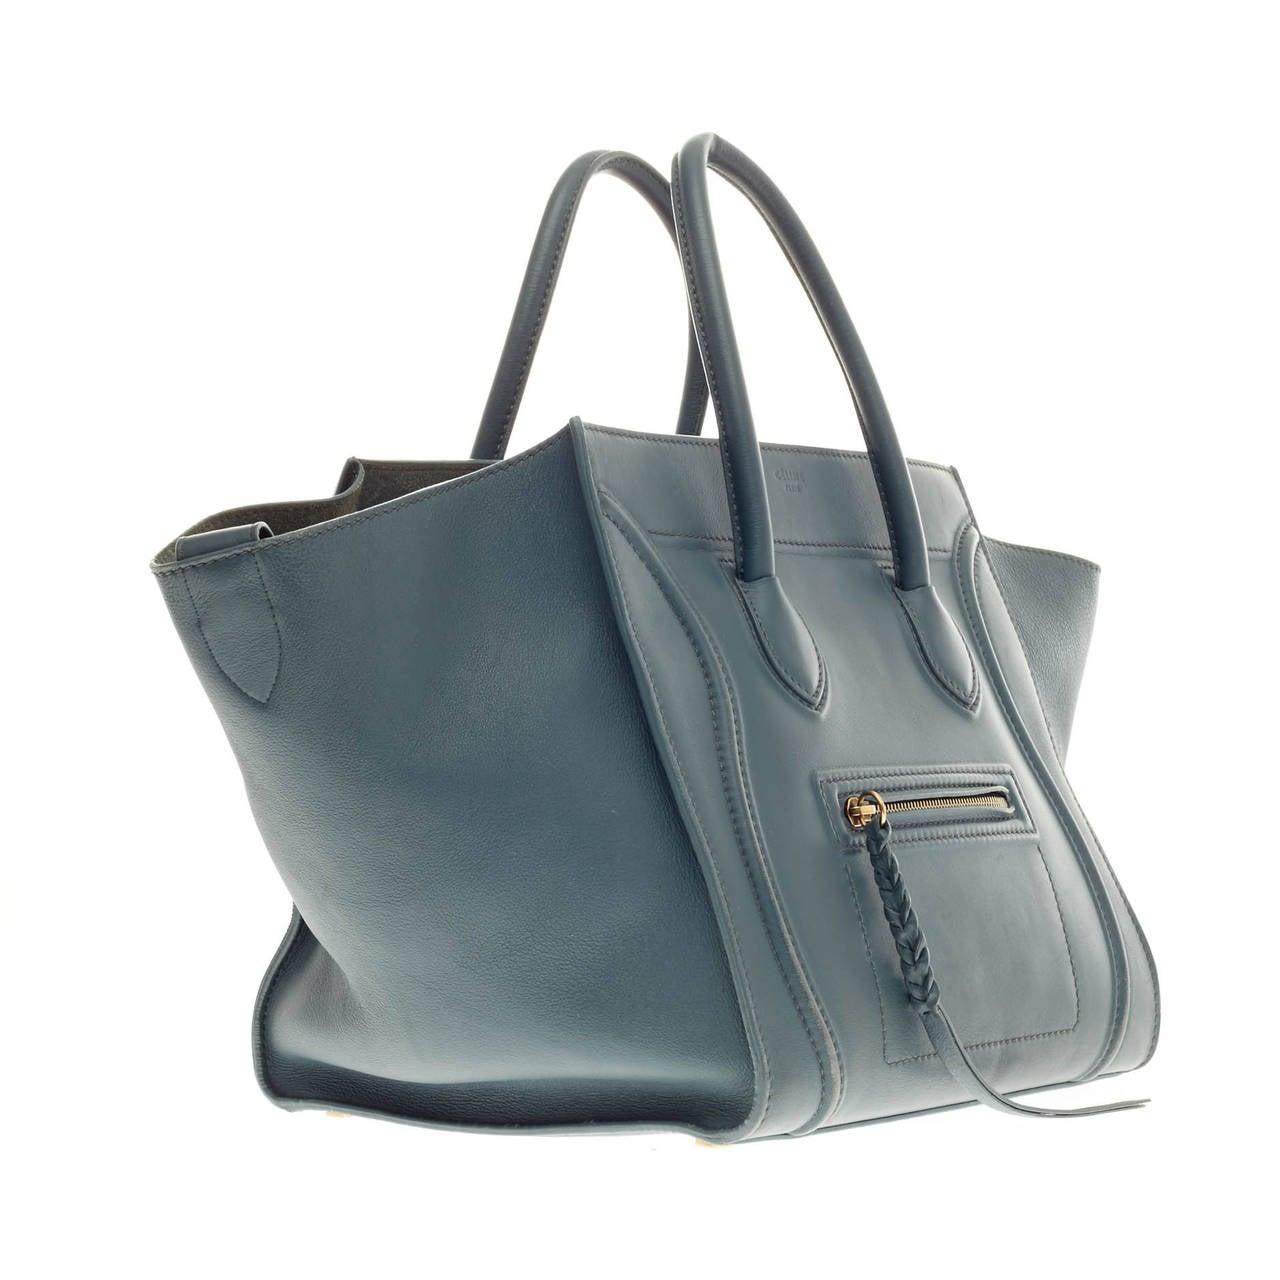 Celine Phantom Smooth Leather Large 3